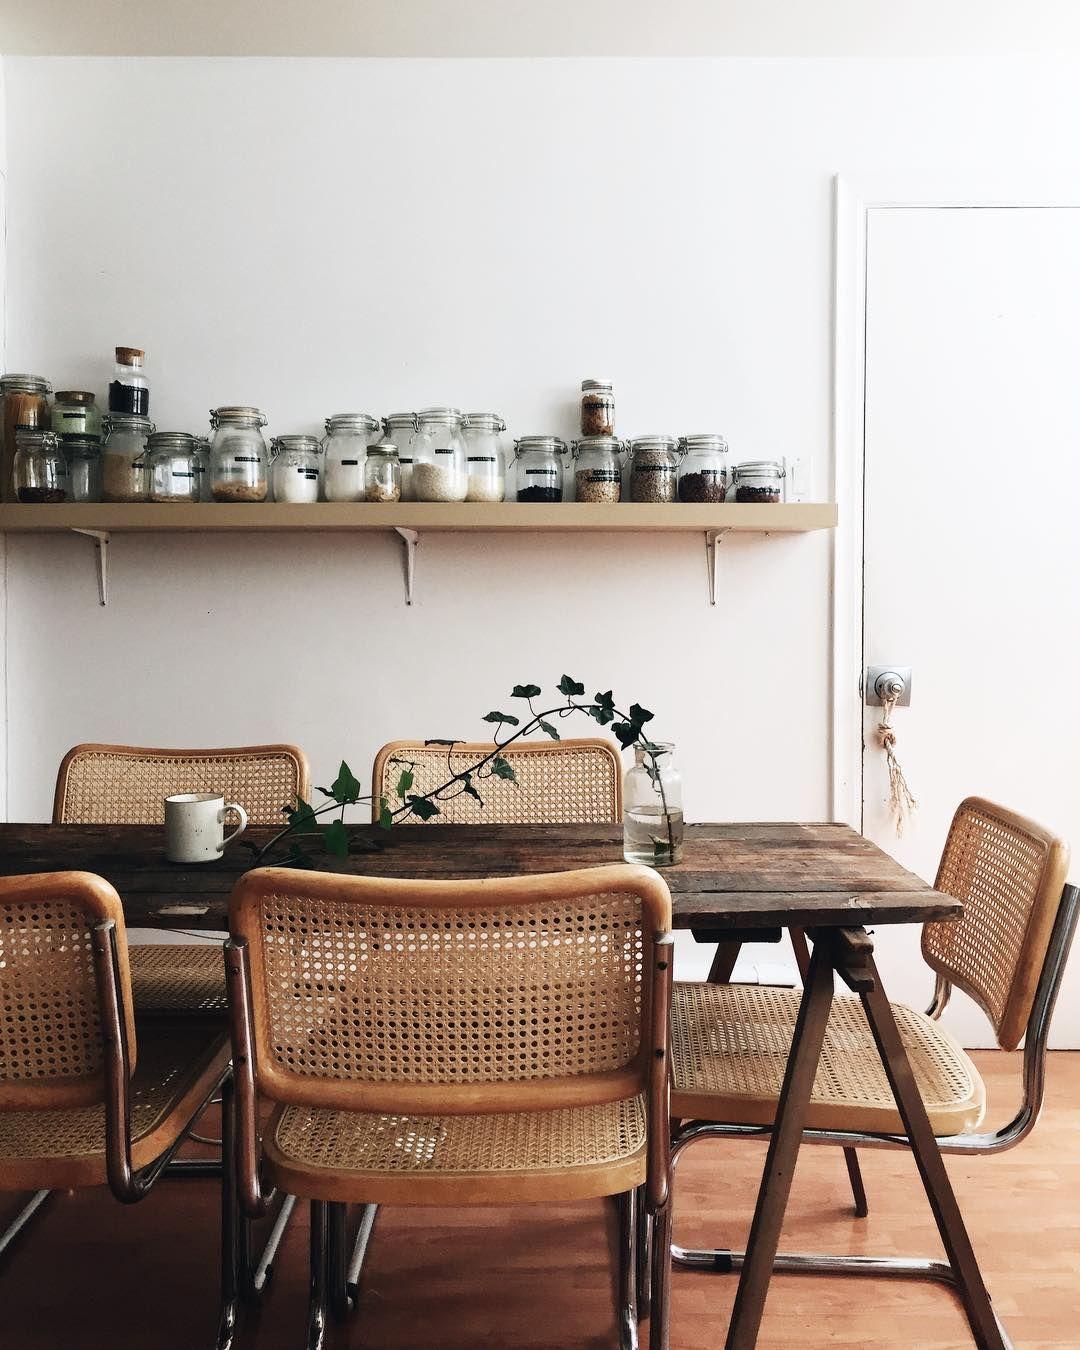 Home interior design dining room pin by charlotte houzet on home kitchen  pinterest  marcel breuer